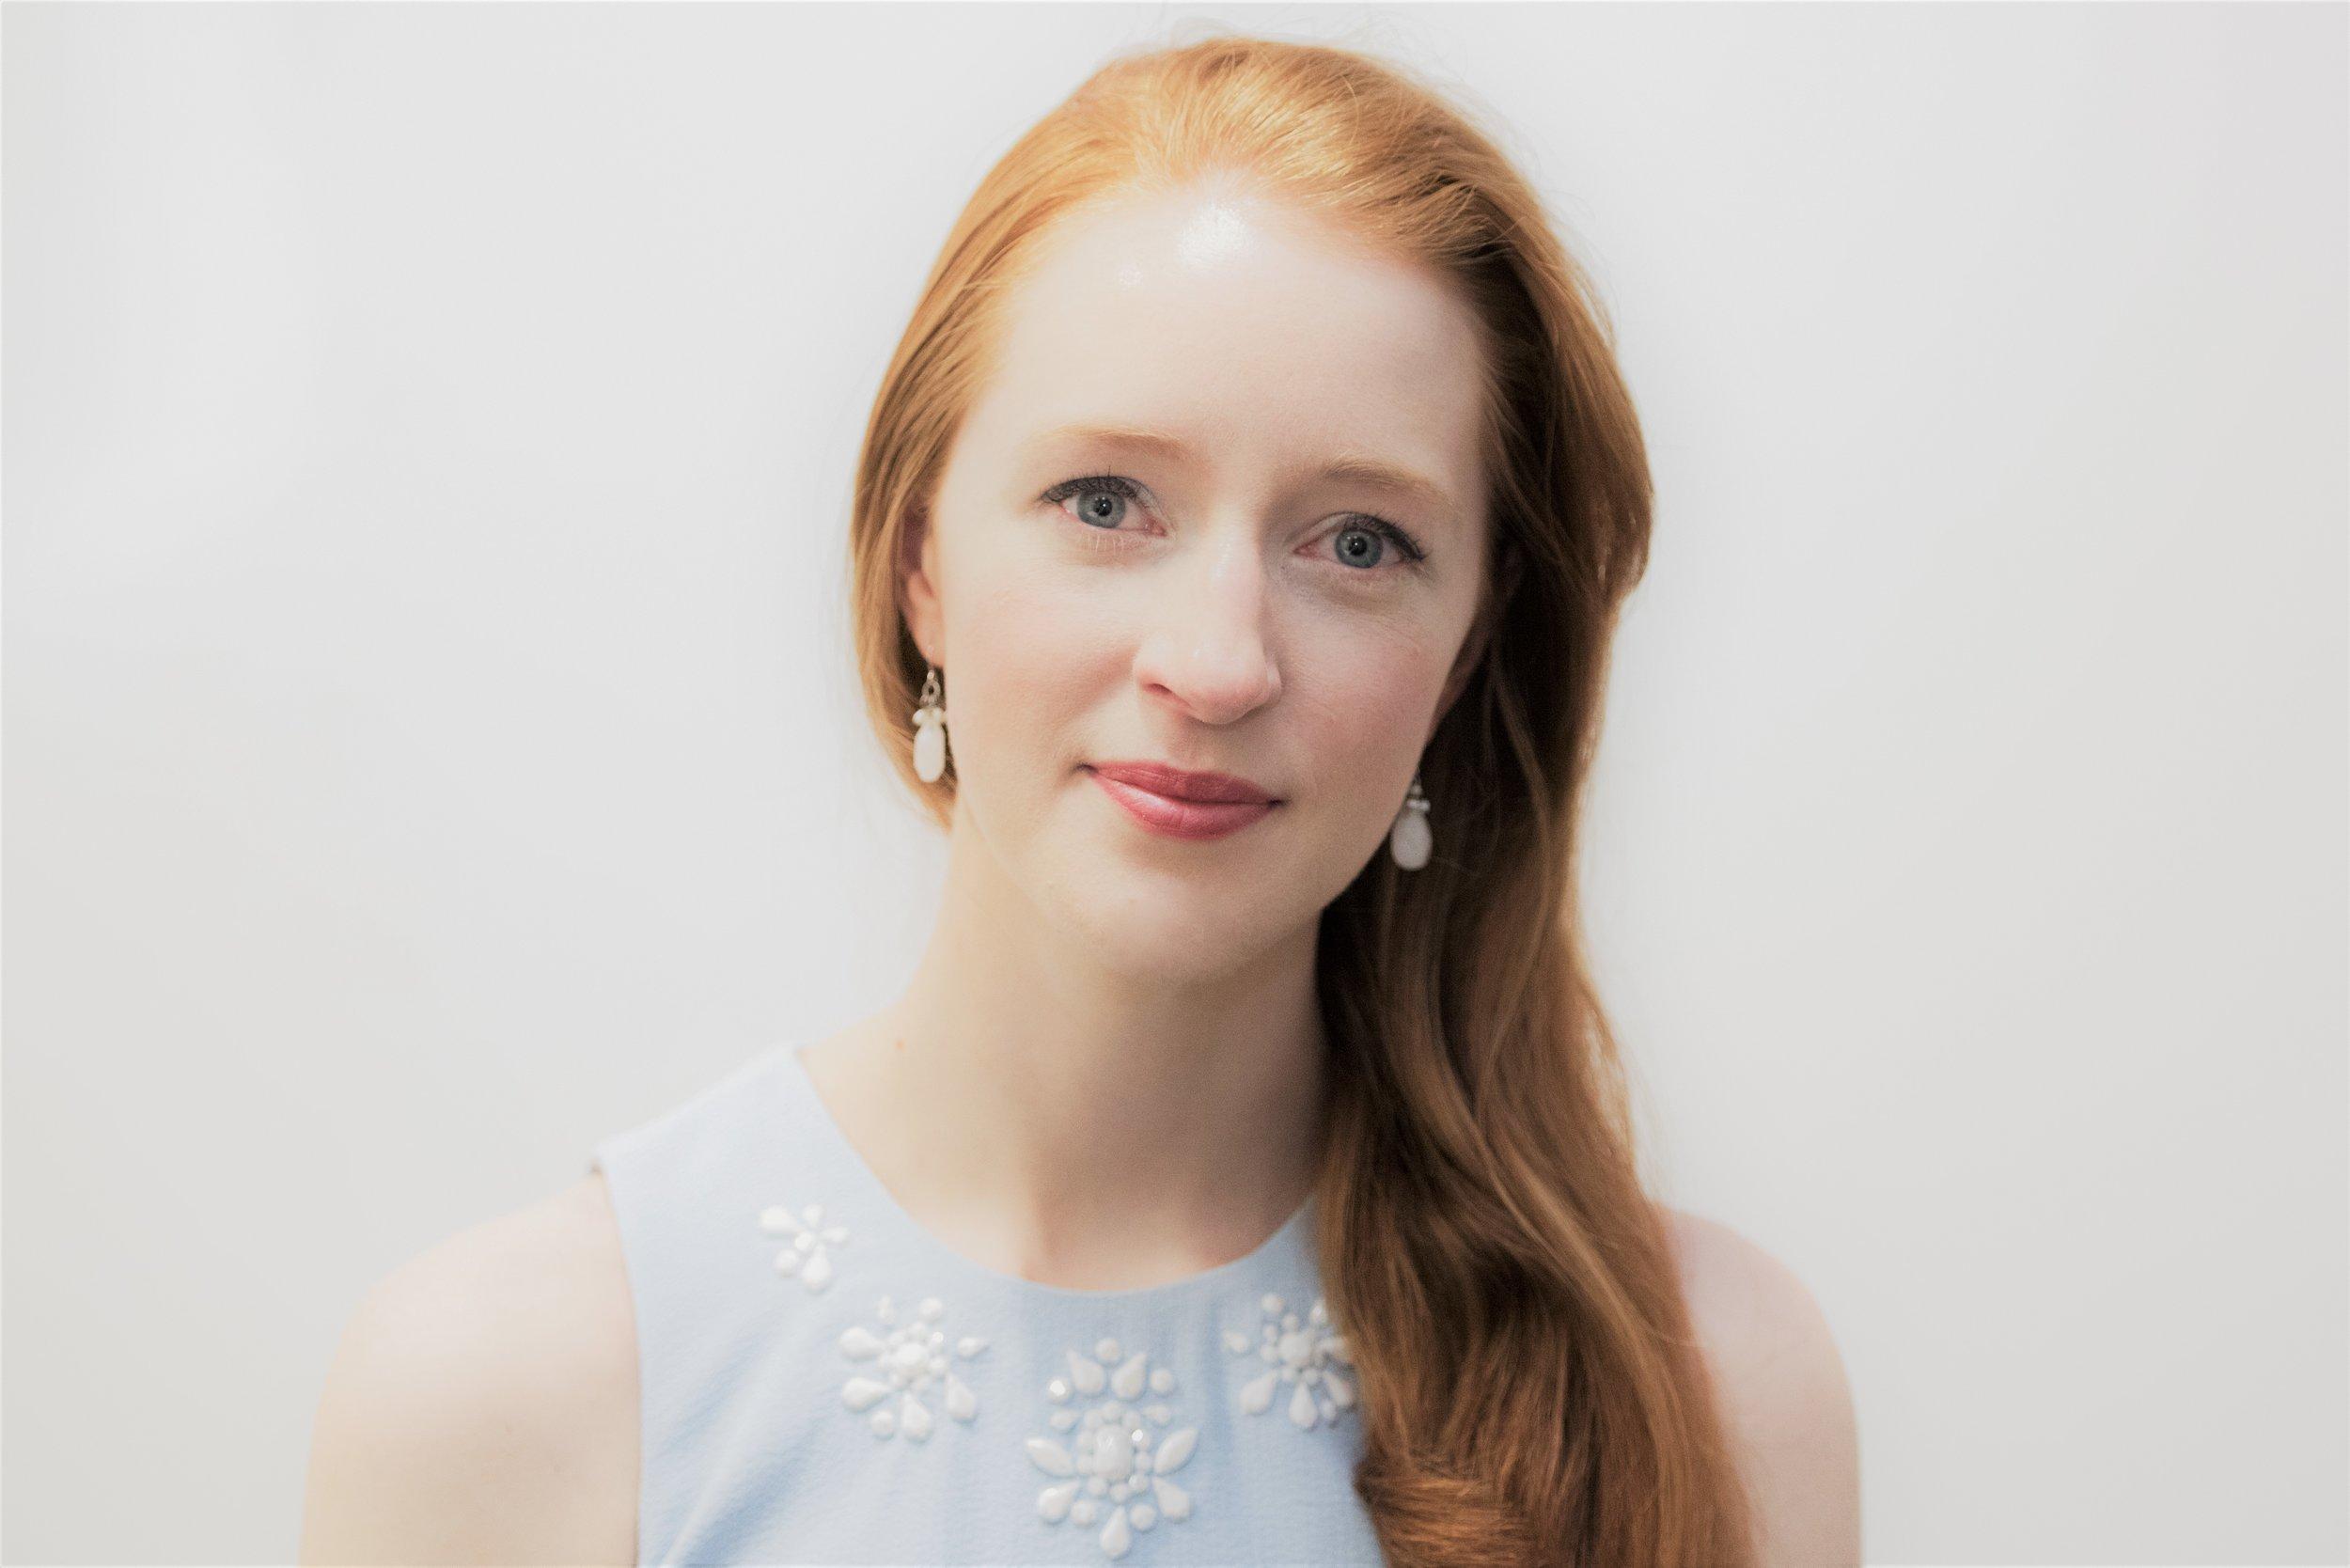 Iona Bain, award-winning founder of youngmoneyblog.co.uk (and a MoneyLens contributor!)